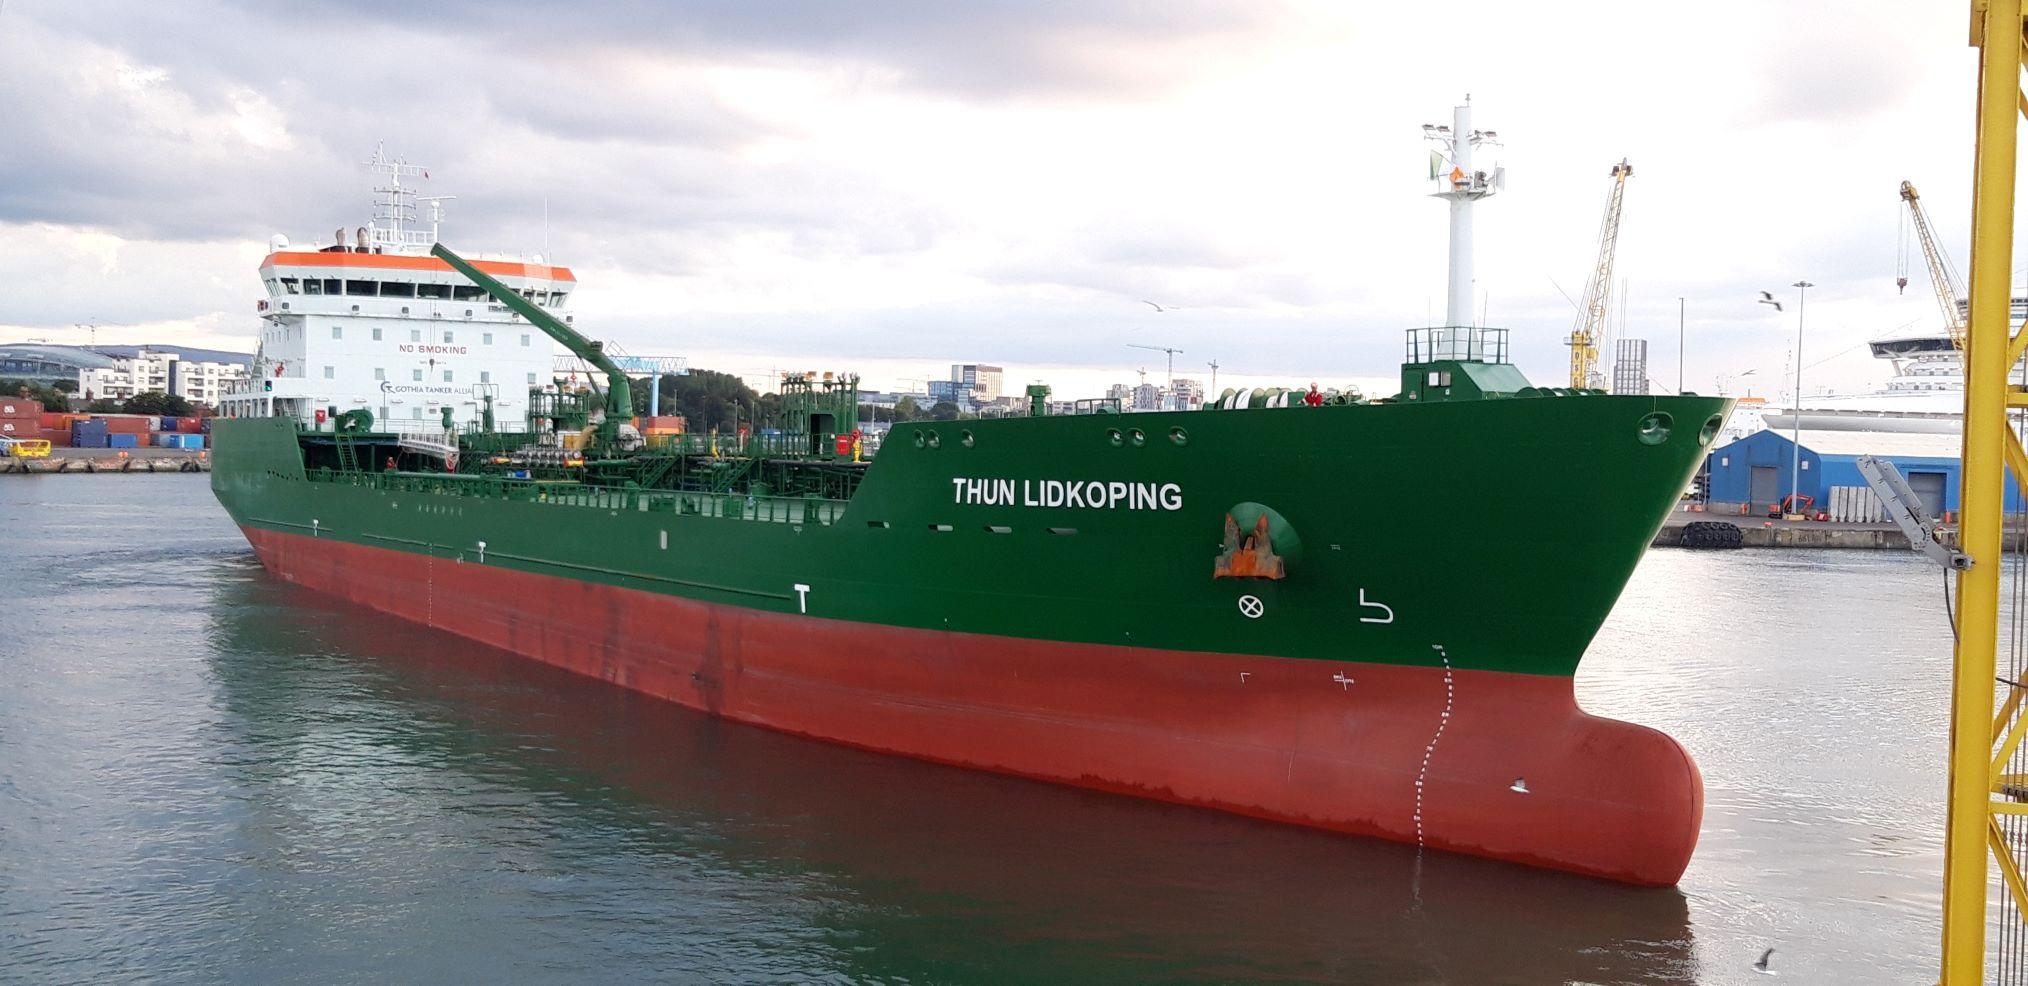 Thun Lidkoping Dublin 2